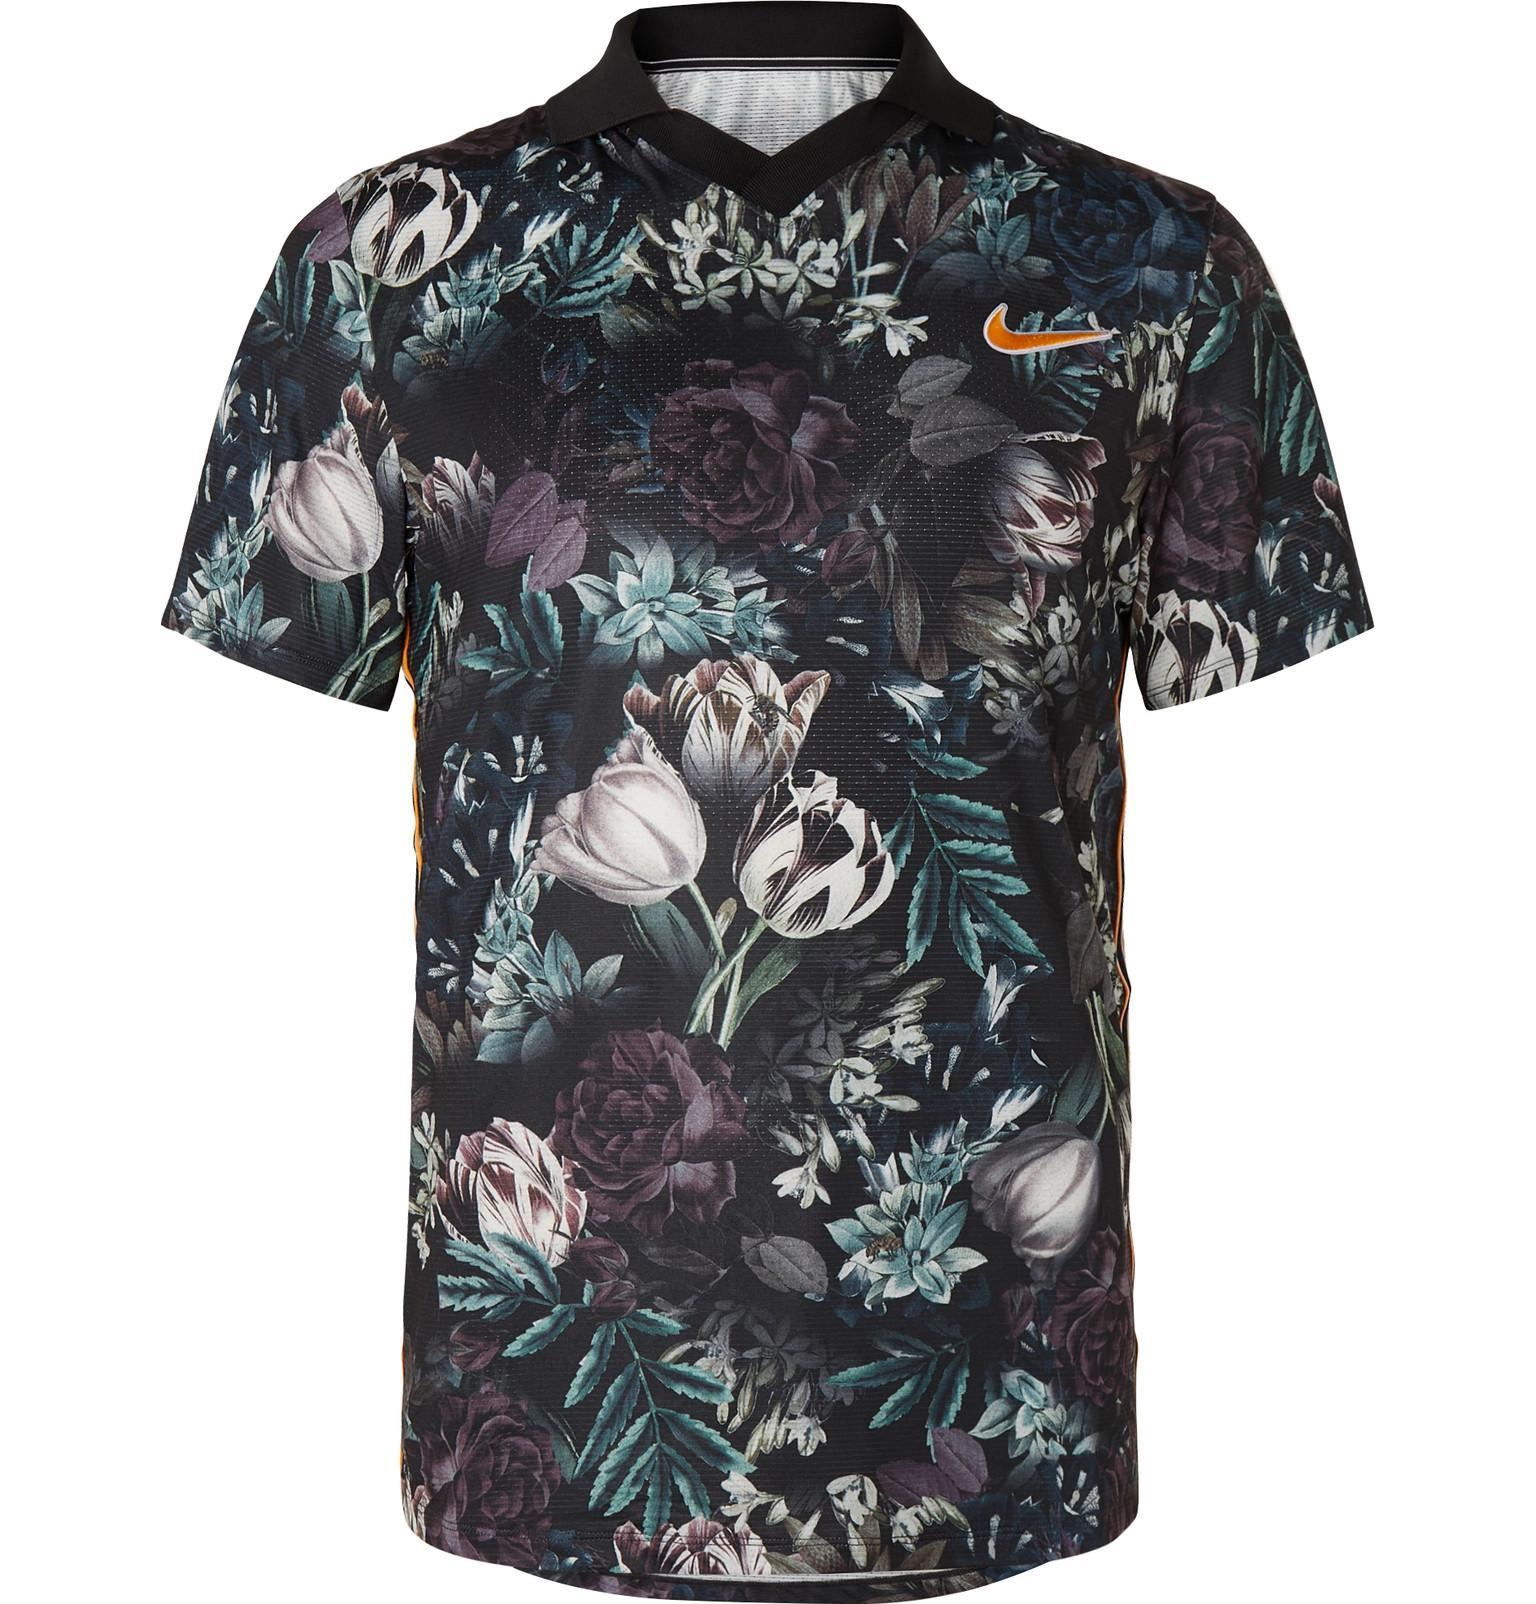 e192634b8 Nike - Black Nikecourt Slam Striped Floral-print Dri-fit Tennis Polo Shirt  for. View fullscreen